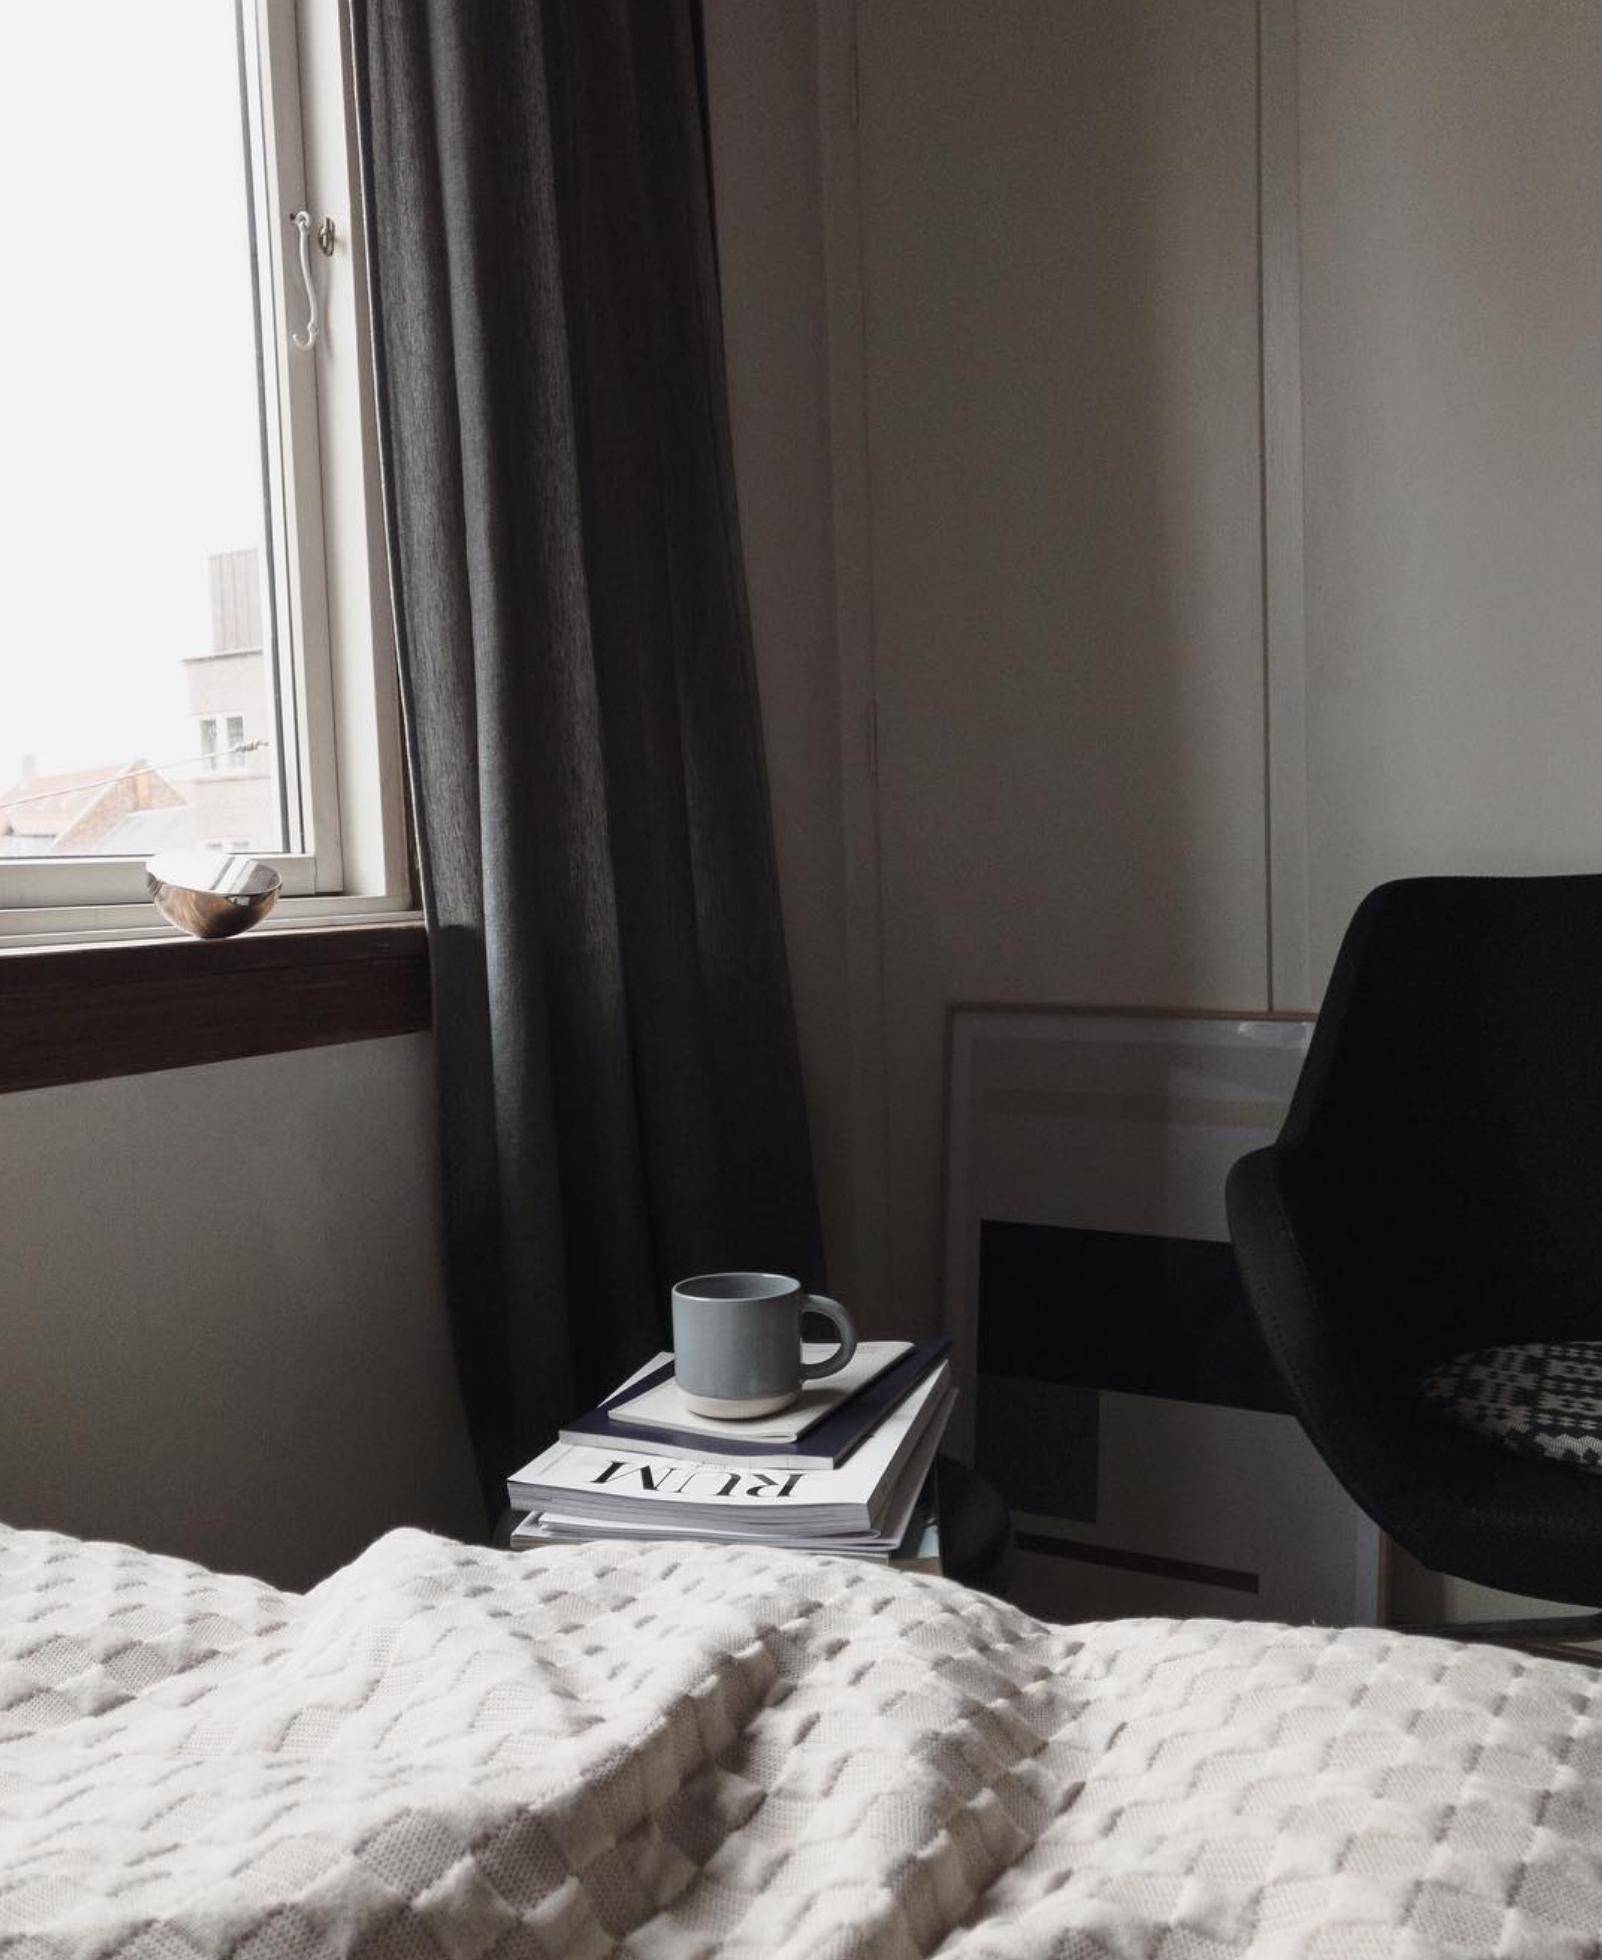 Sunday coffee by @bycdesignstudio